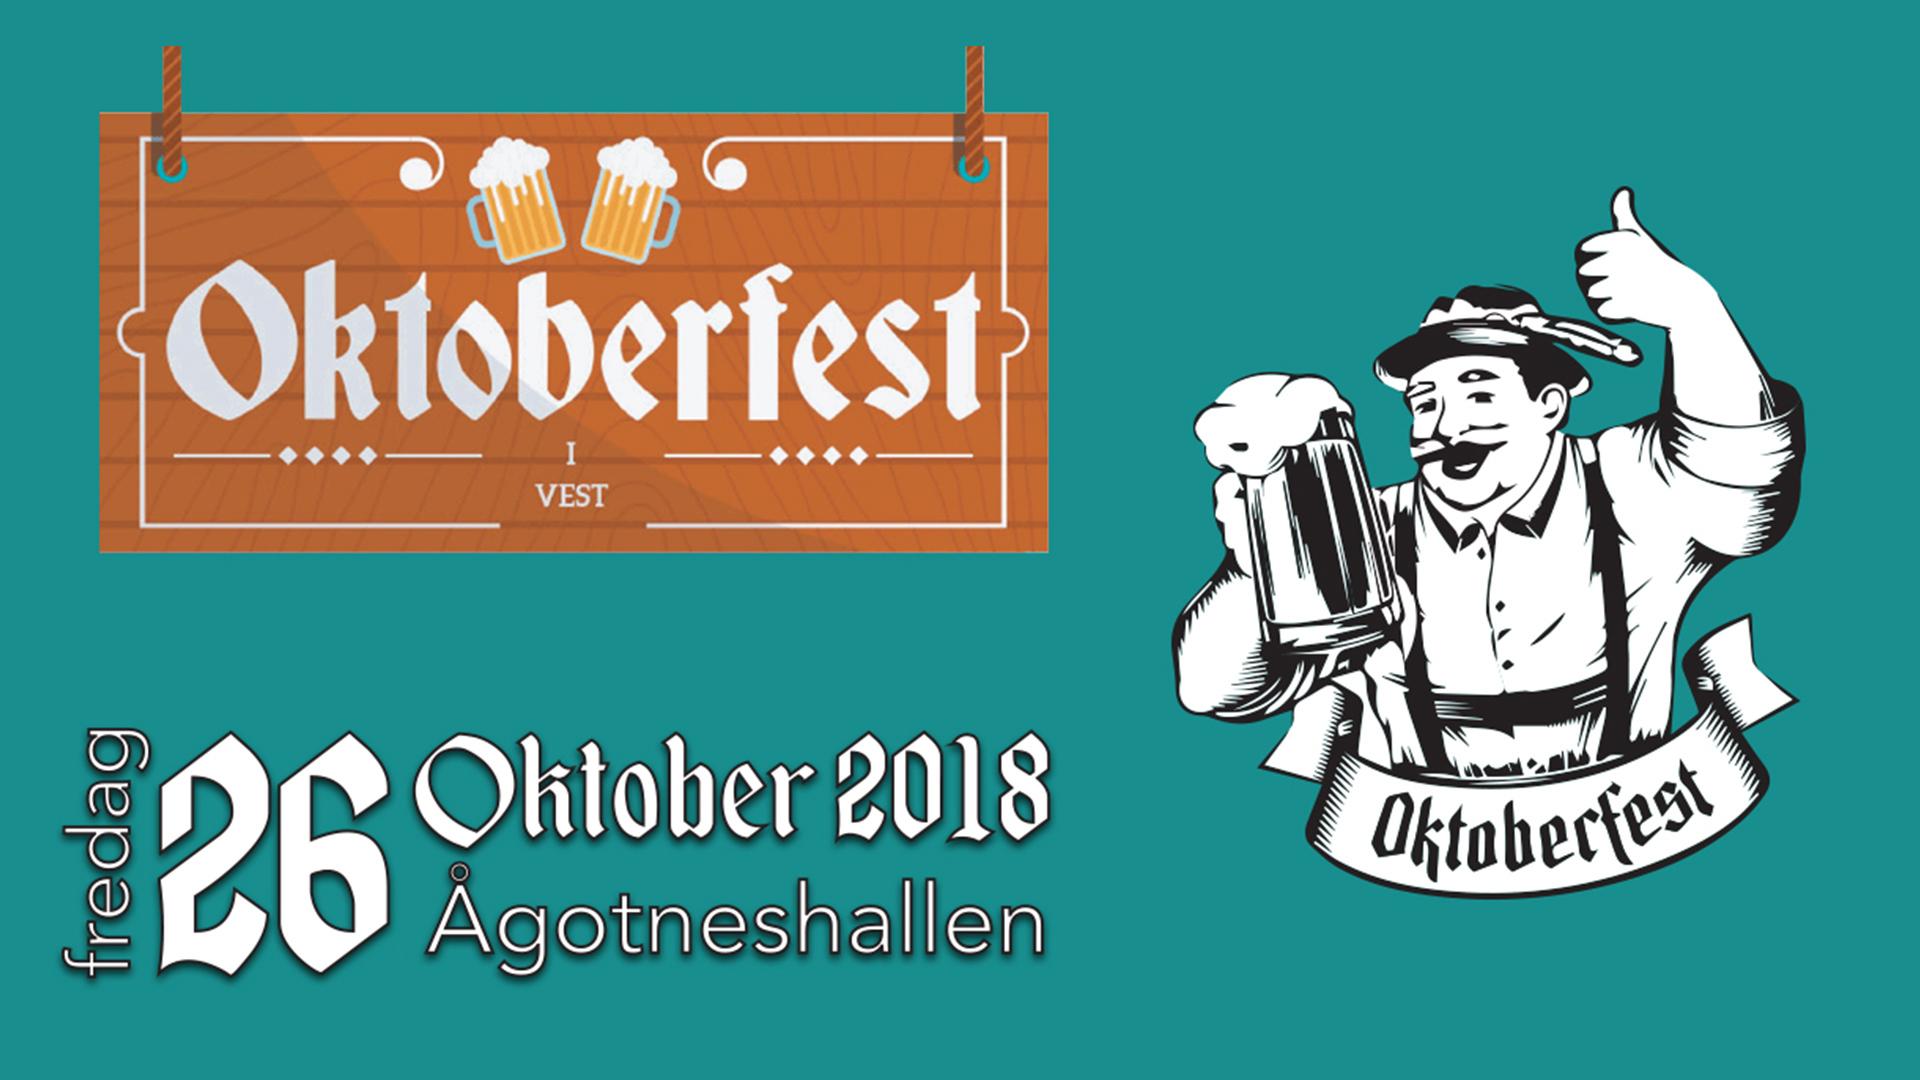 Eviate - Oktoberfest i Vest